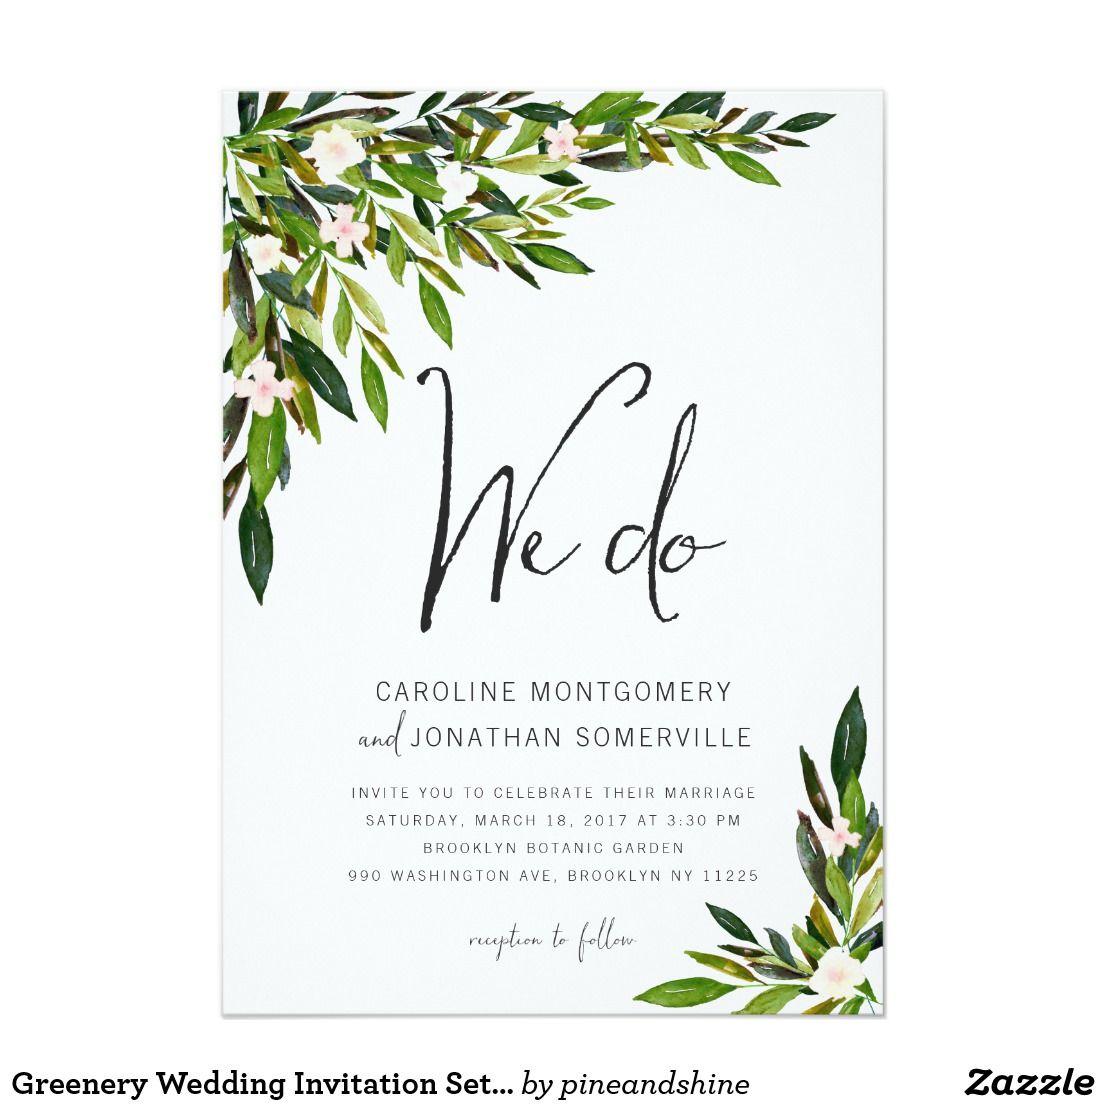 Greenery Wedding Invitation Set Botanical Invite ...